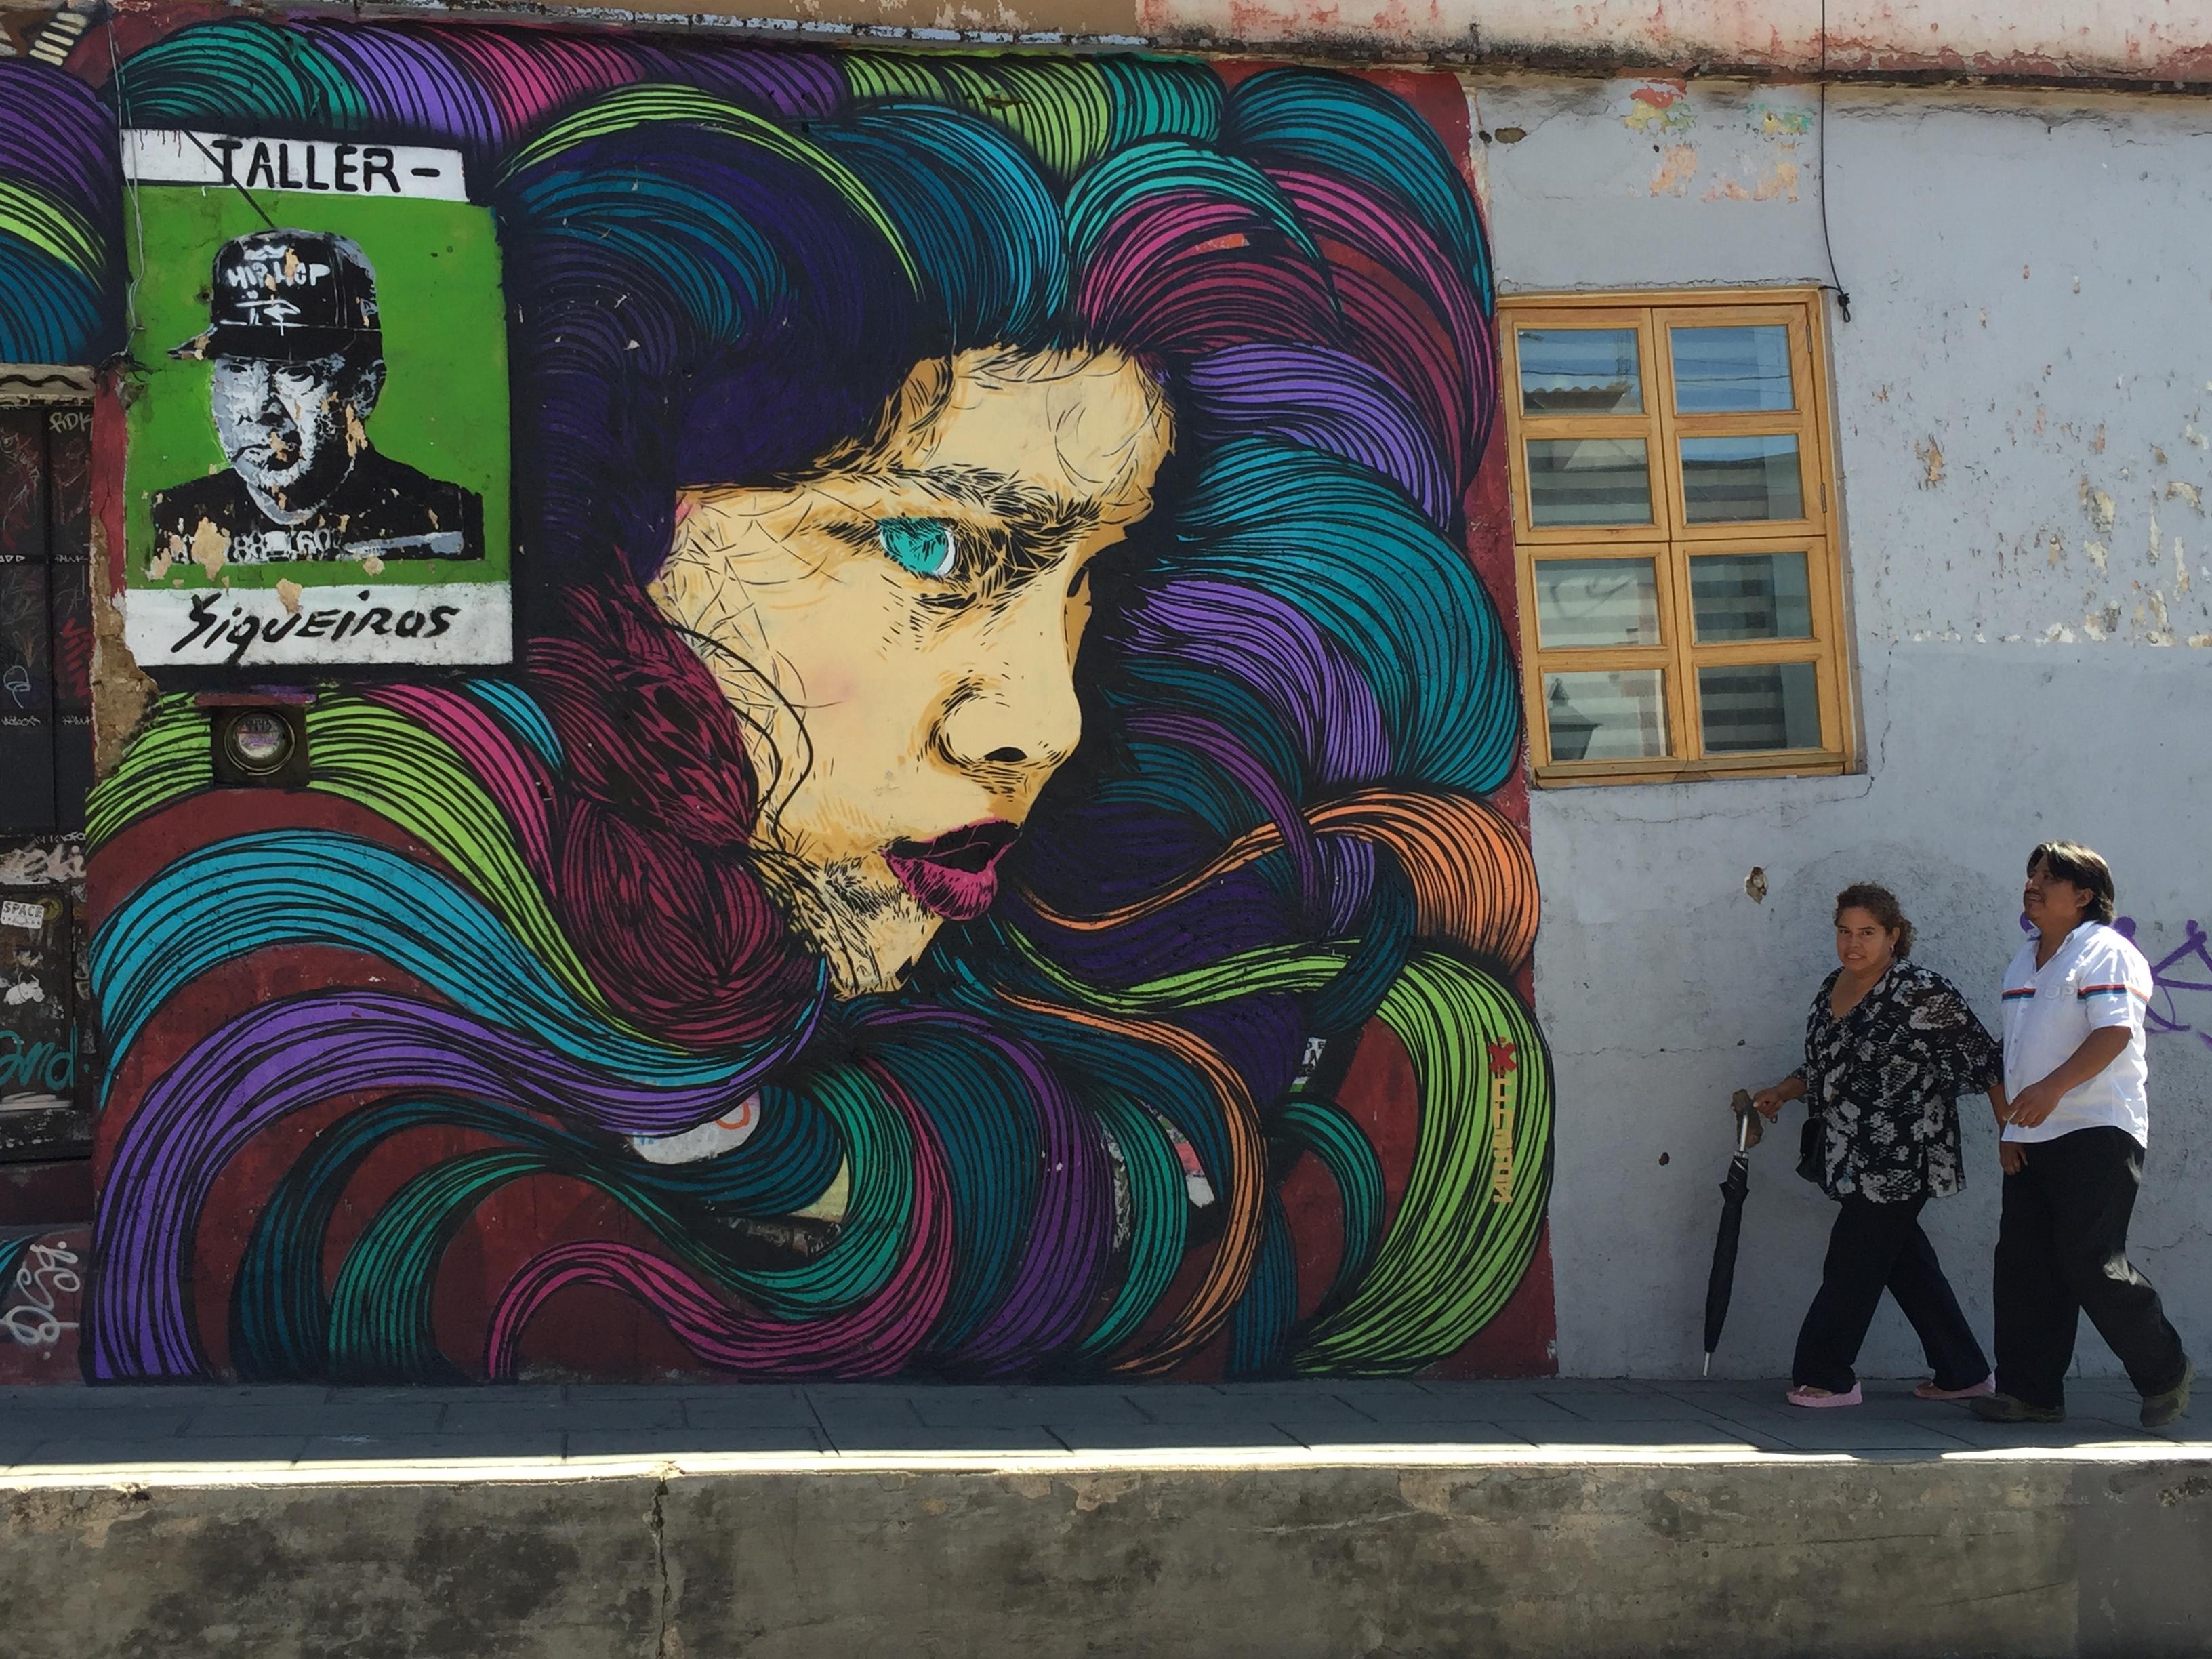 Mural of woman in jewel tones